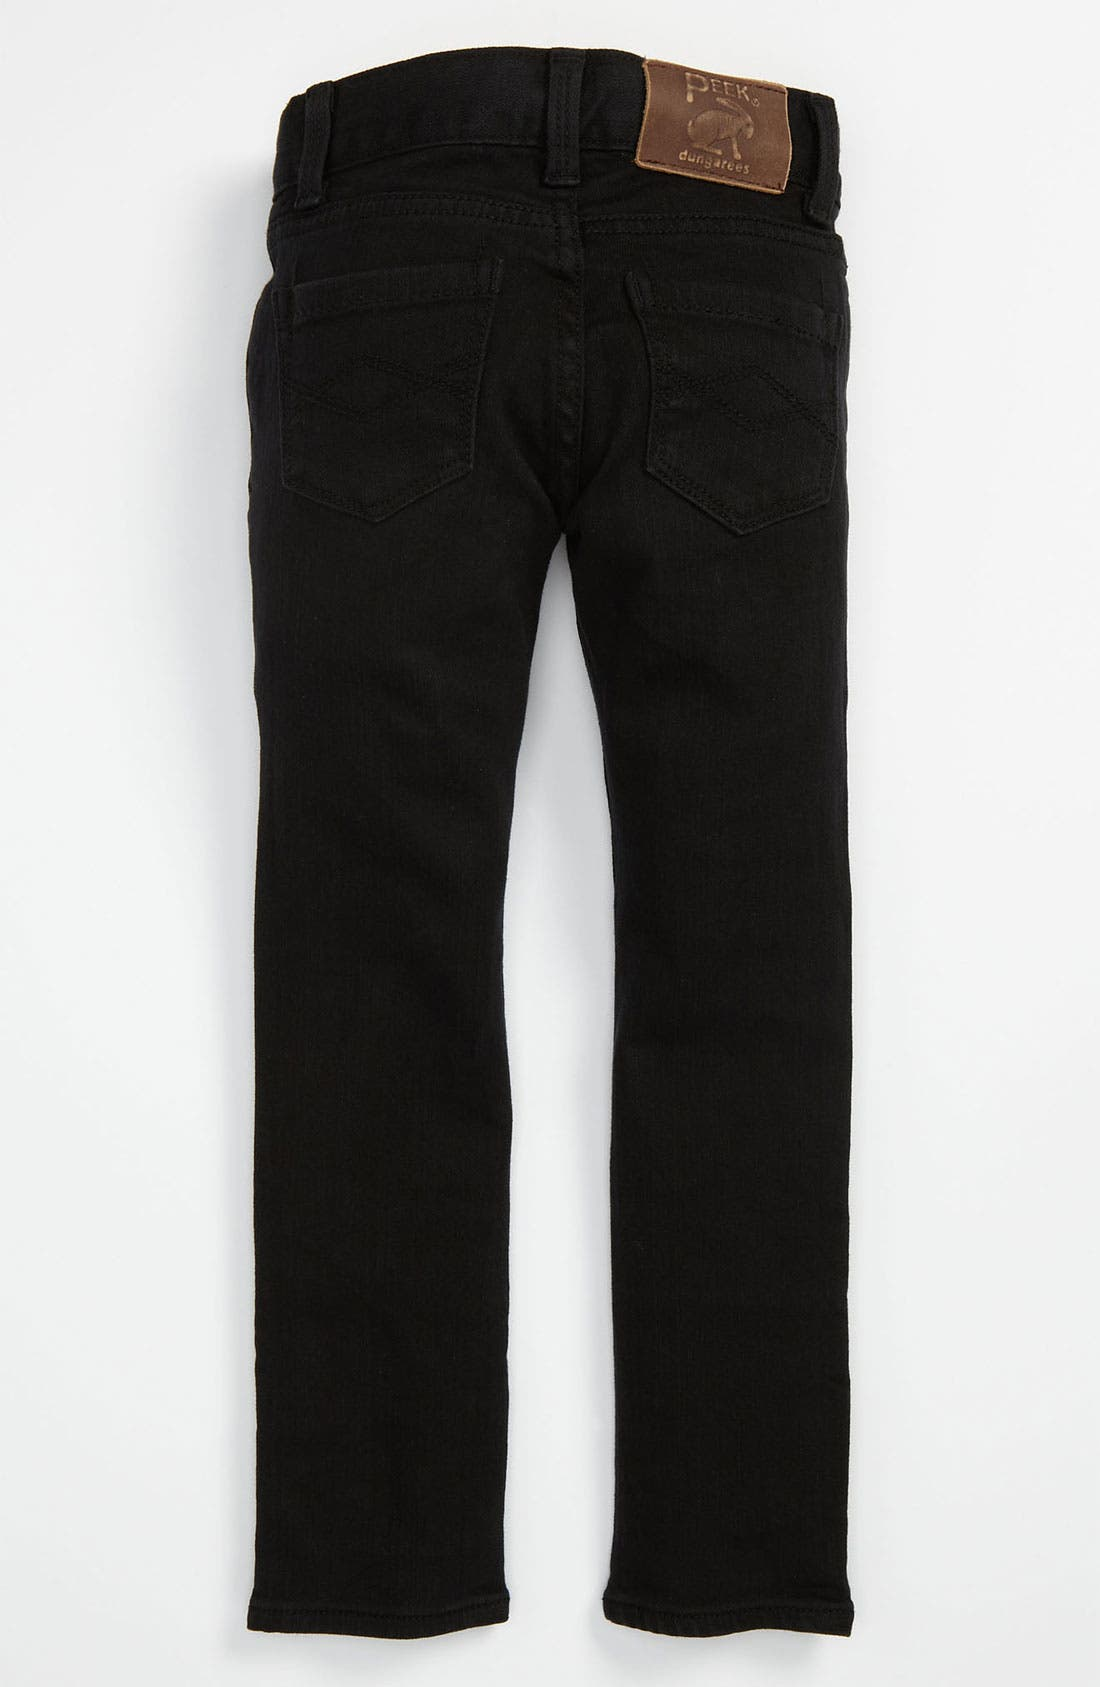 Main Image - Peek 'Audrey' Jeans (Toddler, Little Girls & Big Girls)